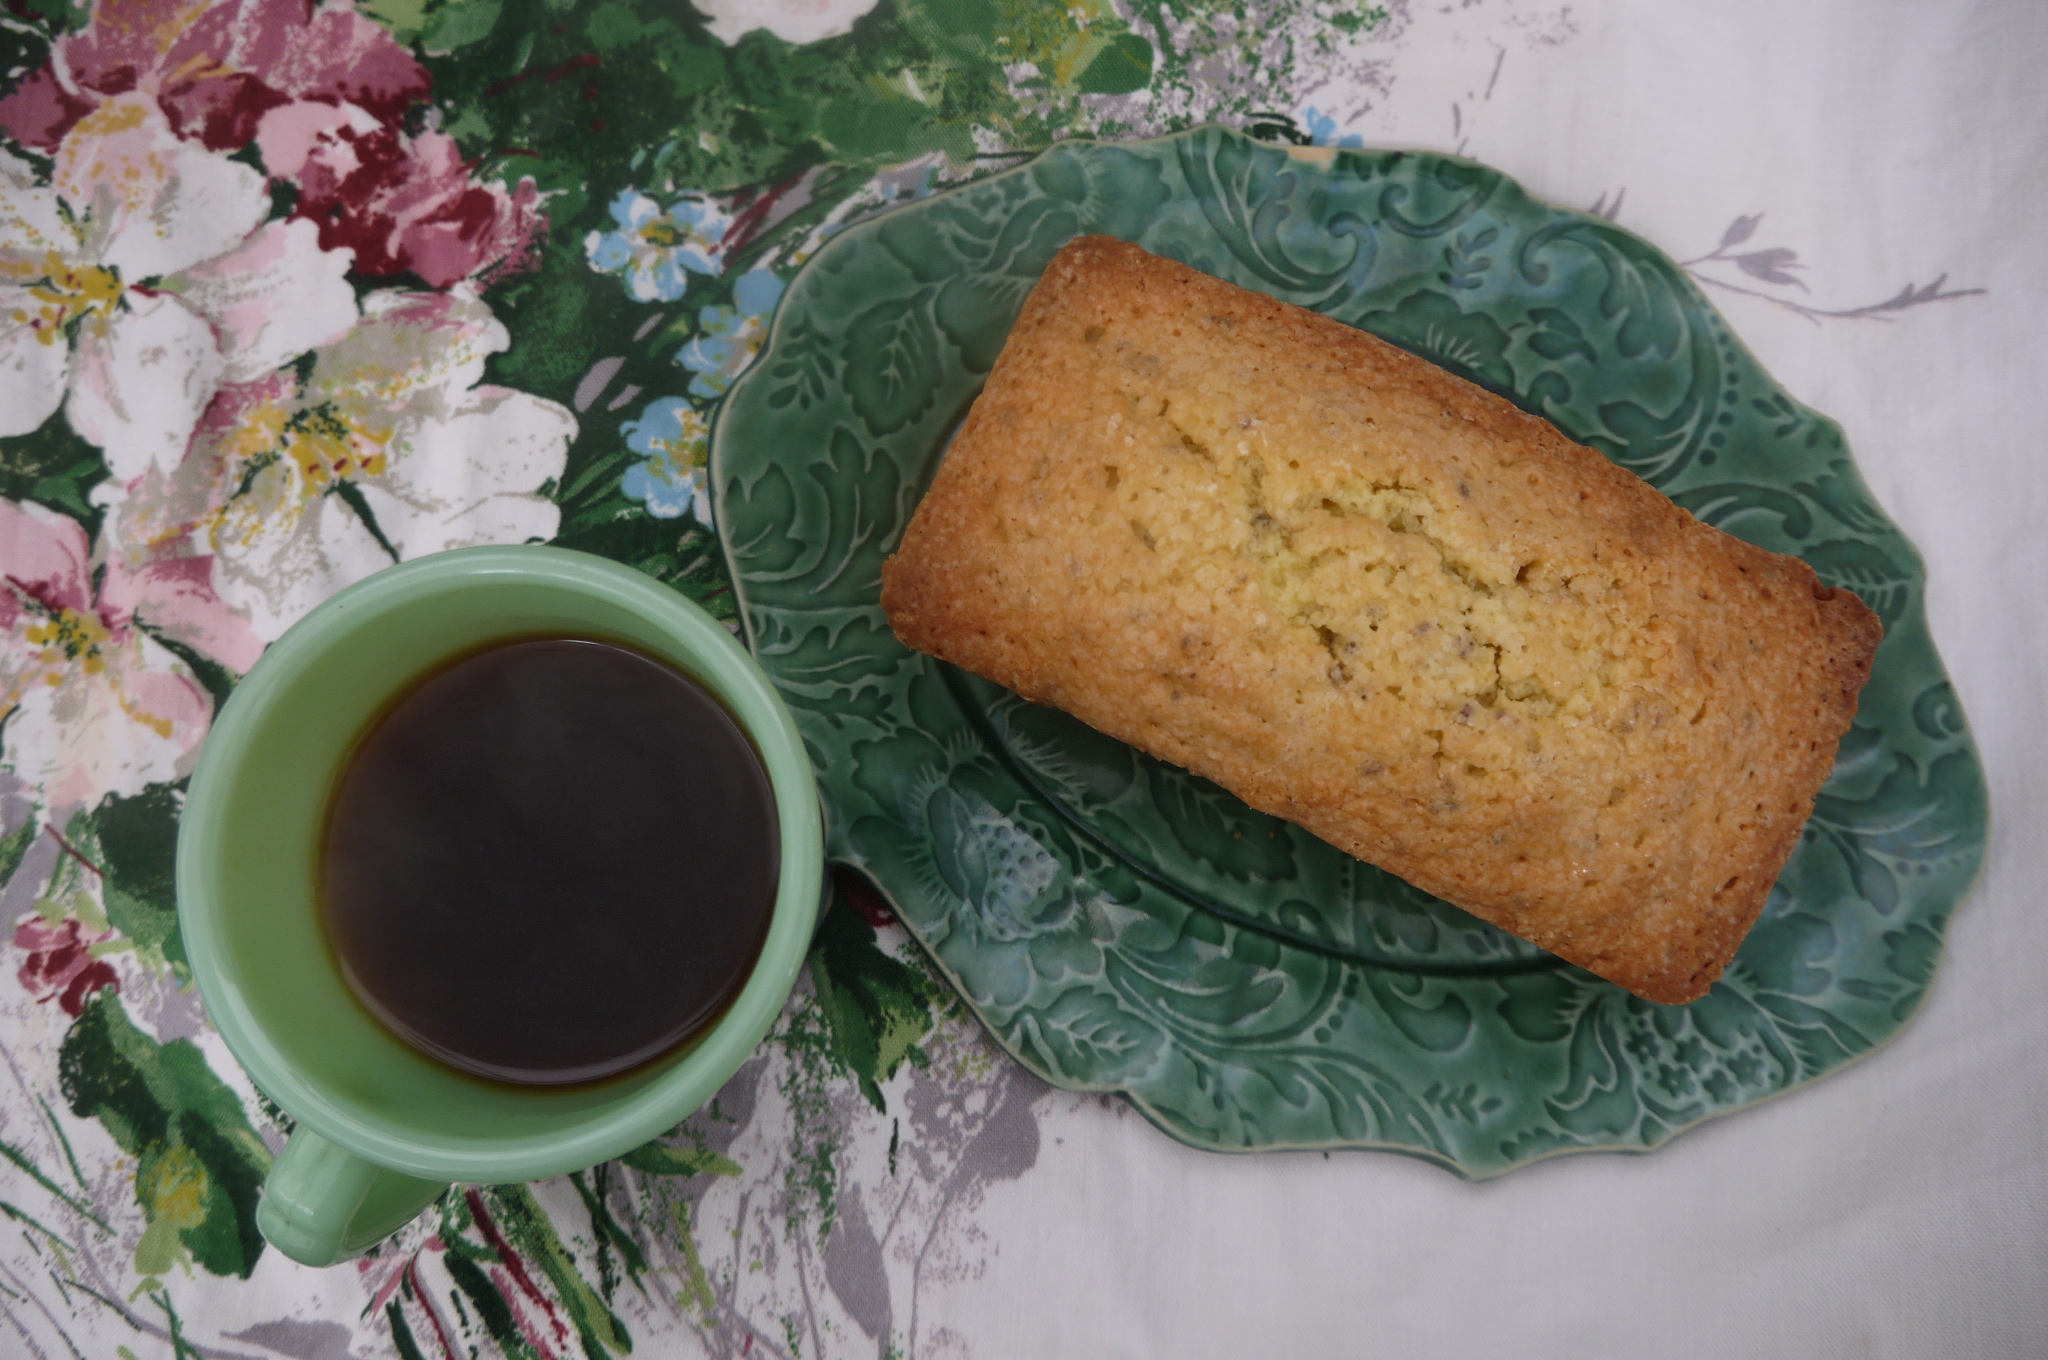 anise pound cake - trustinkim.com